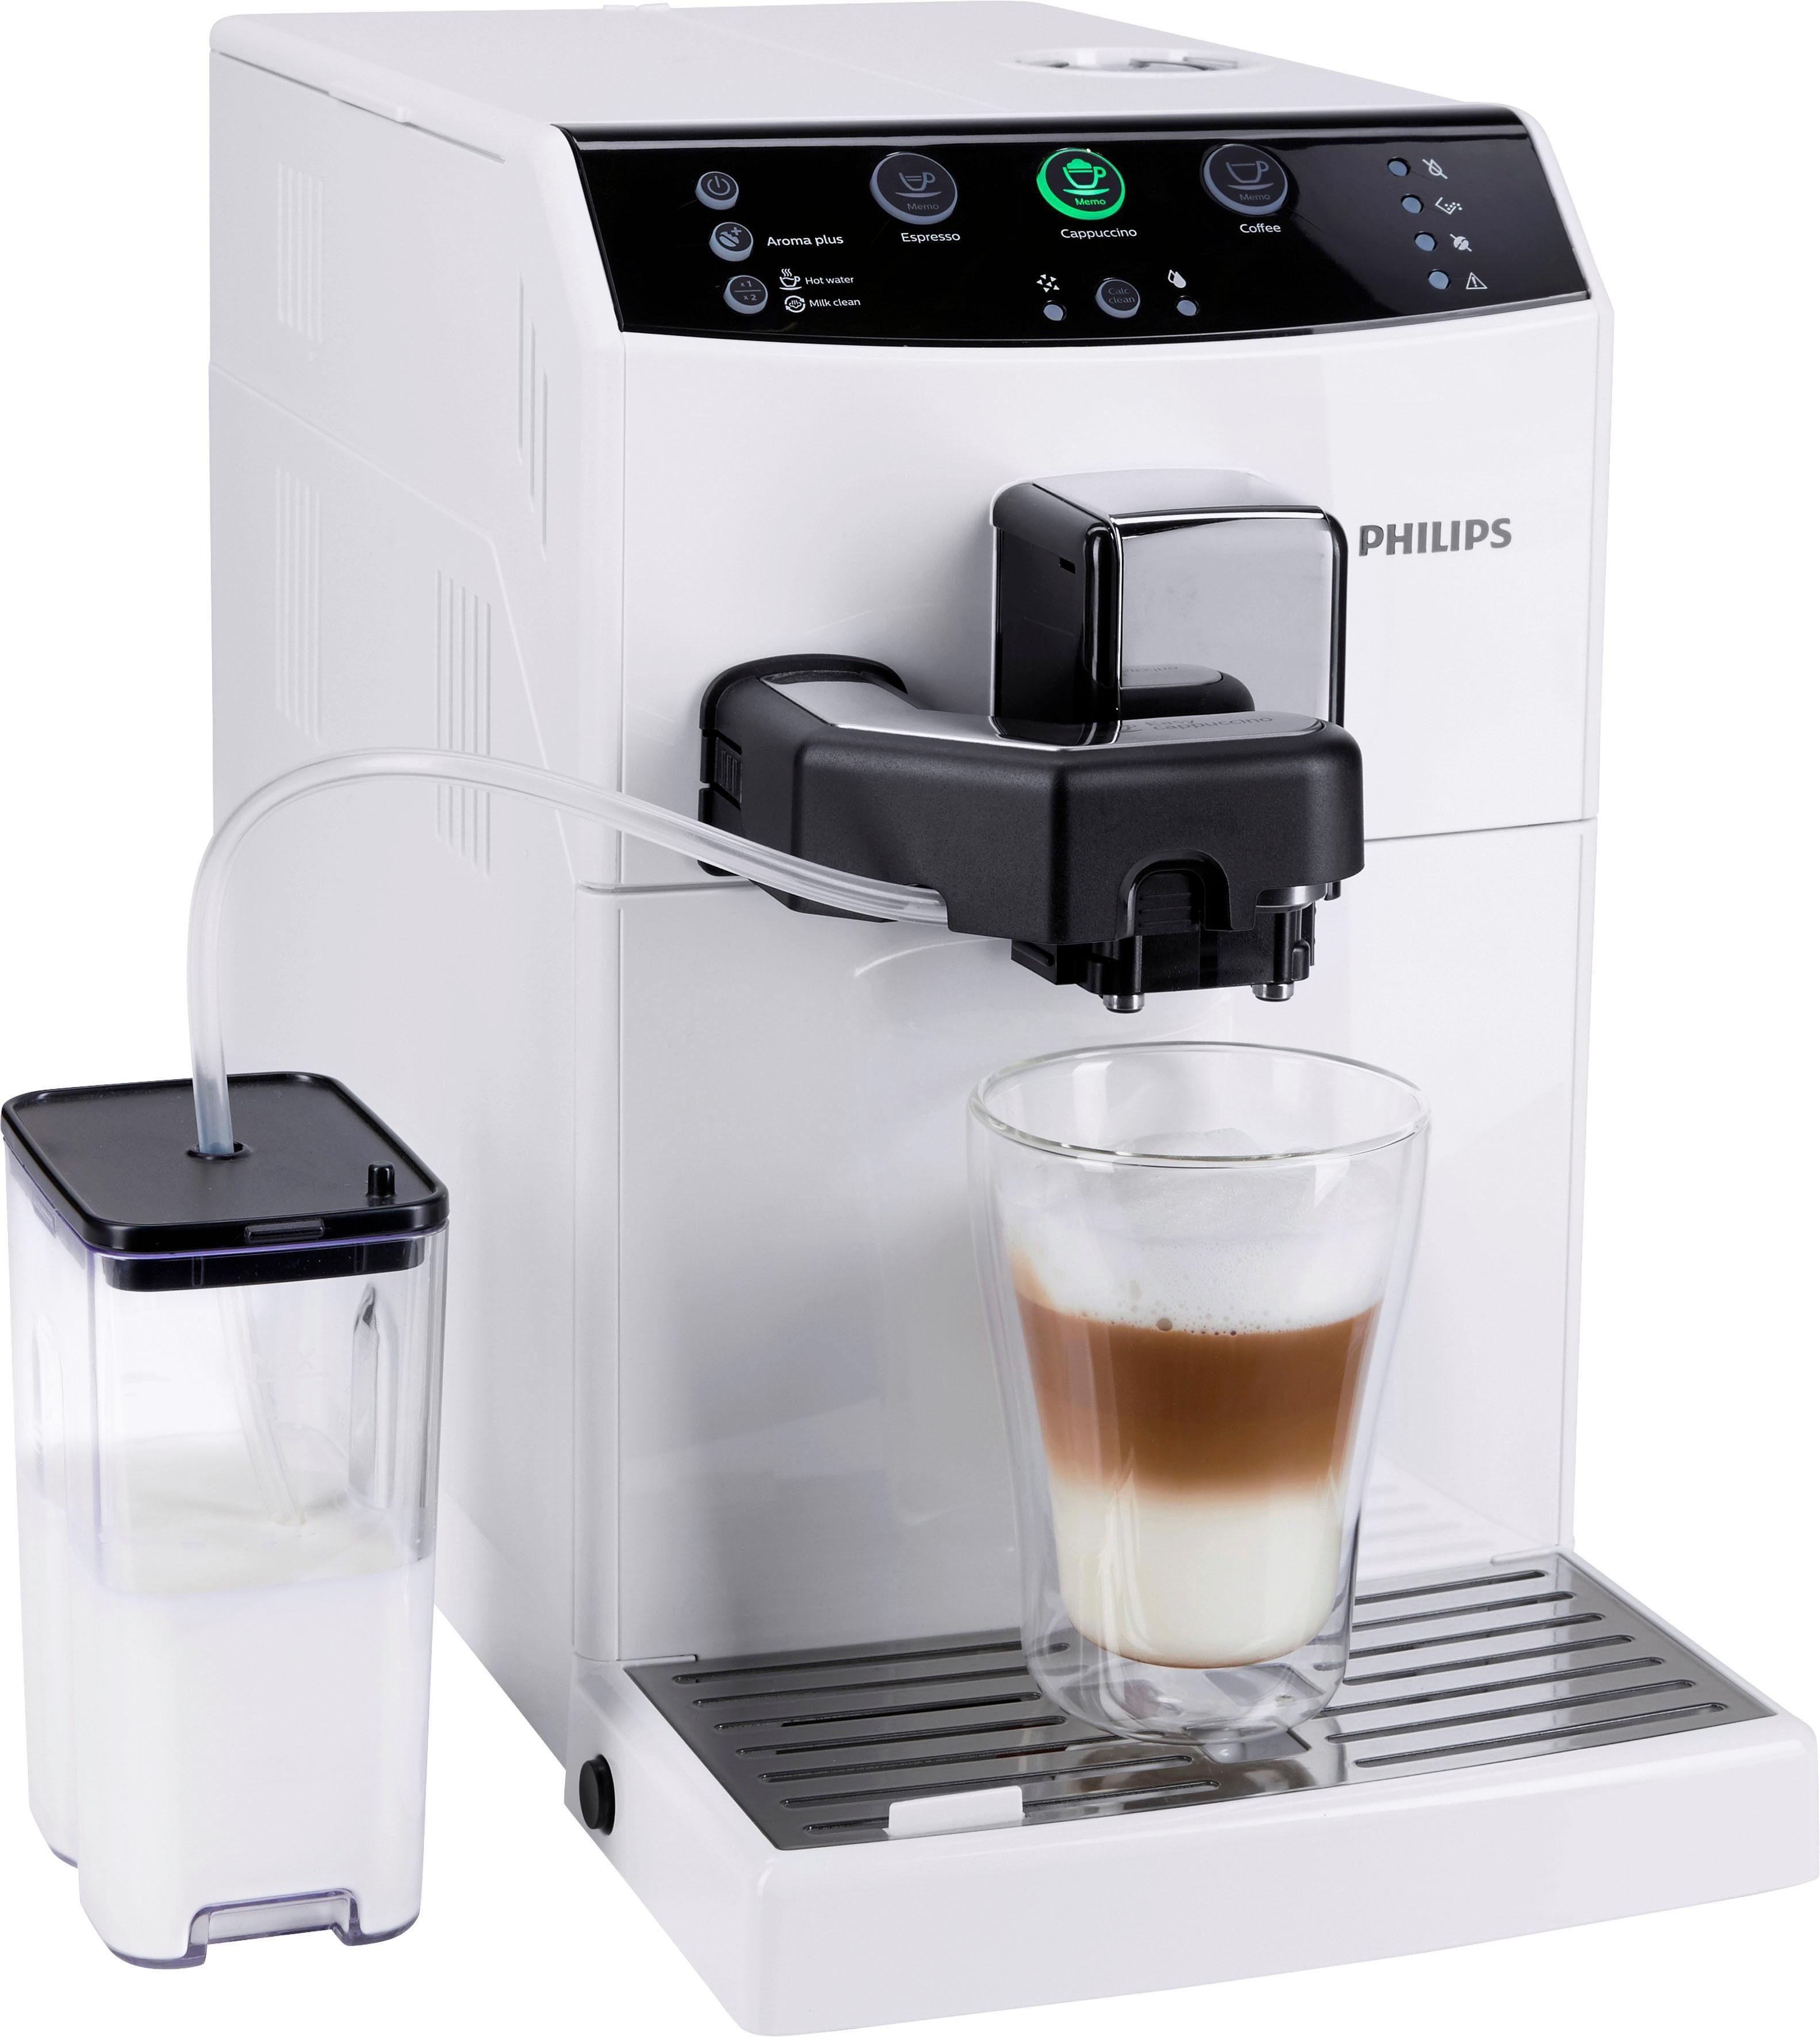 Philips Kaffeevollautomat 3000 Serie HD8830/12, EasyCappuccino, klavierlack-weiß